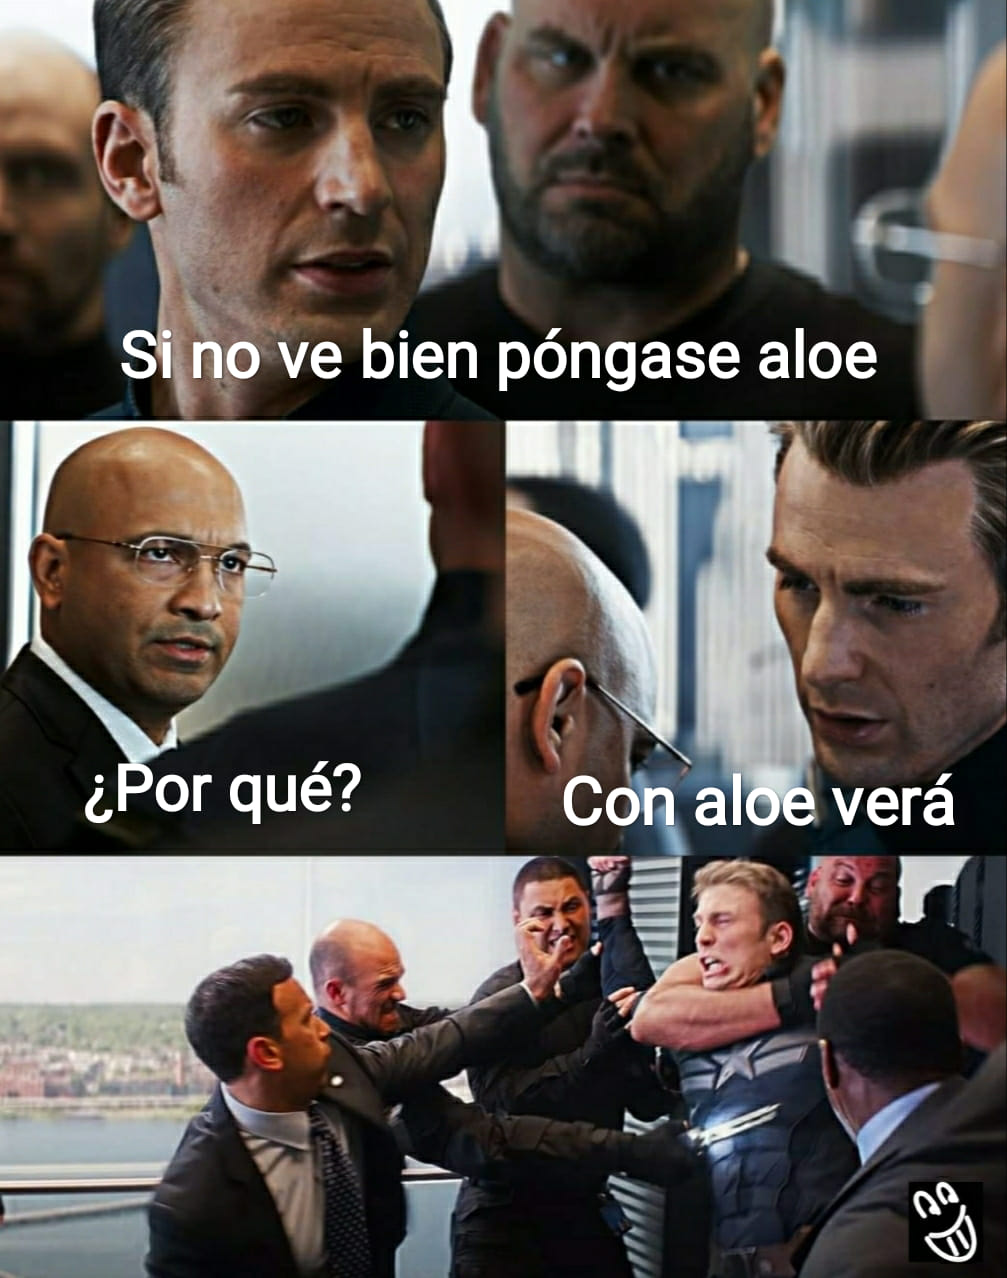 Meme Capitán América Aloe Vera